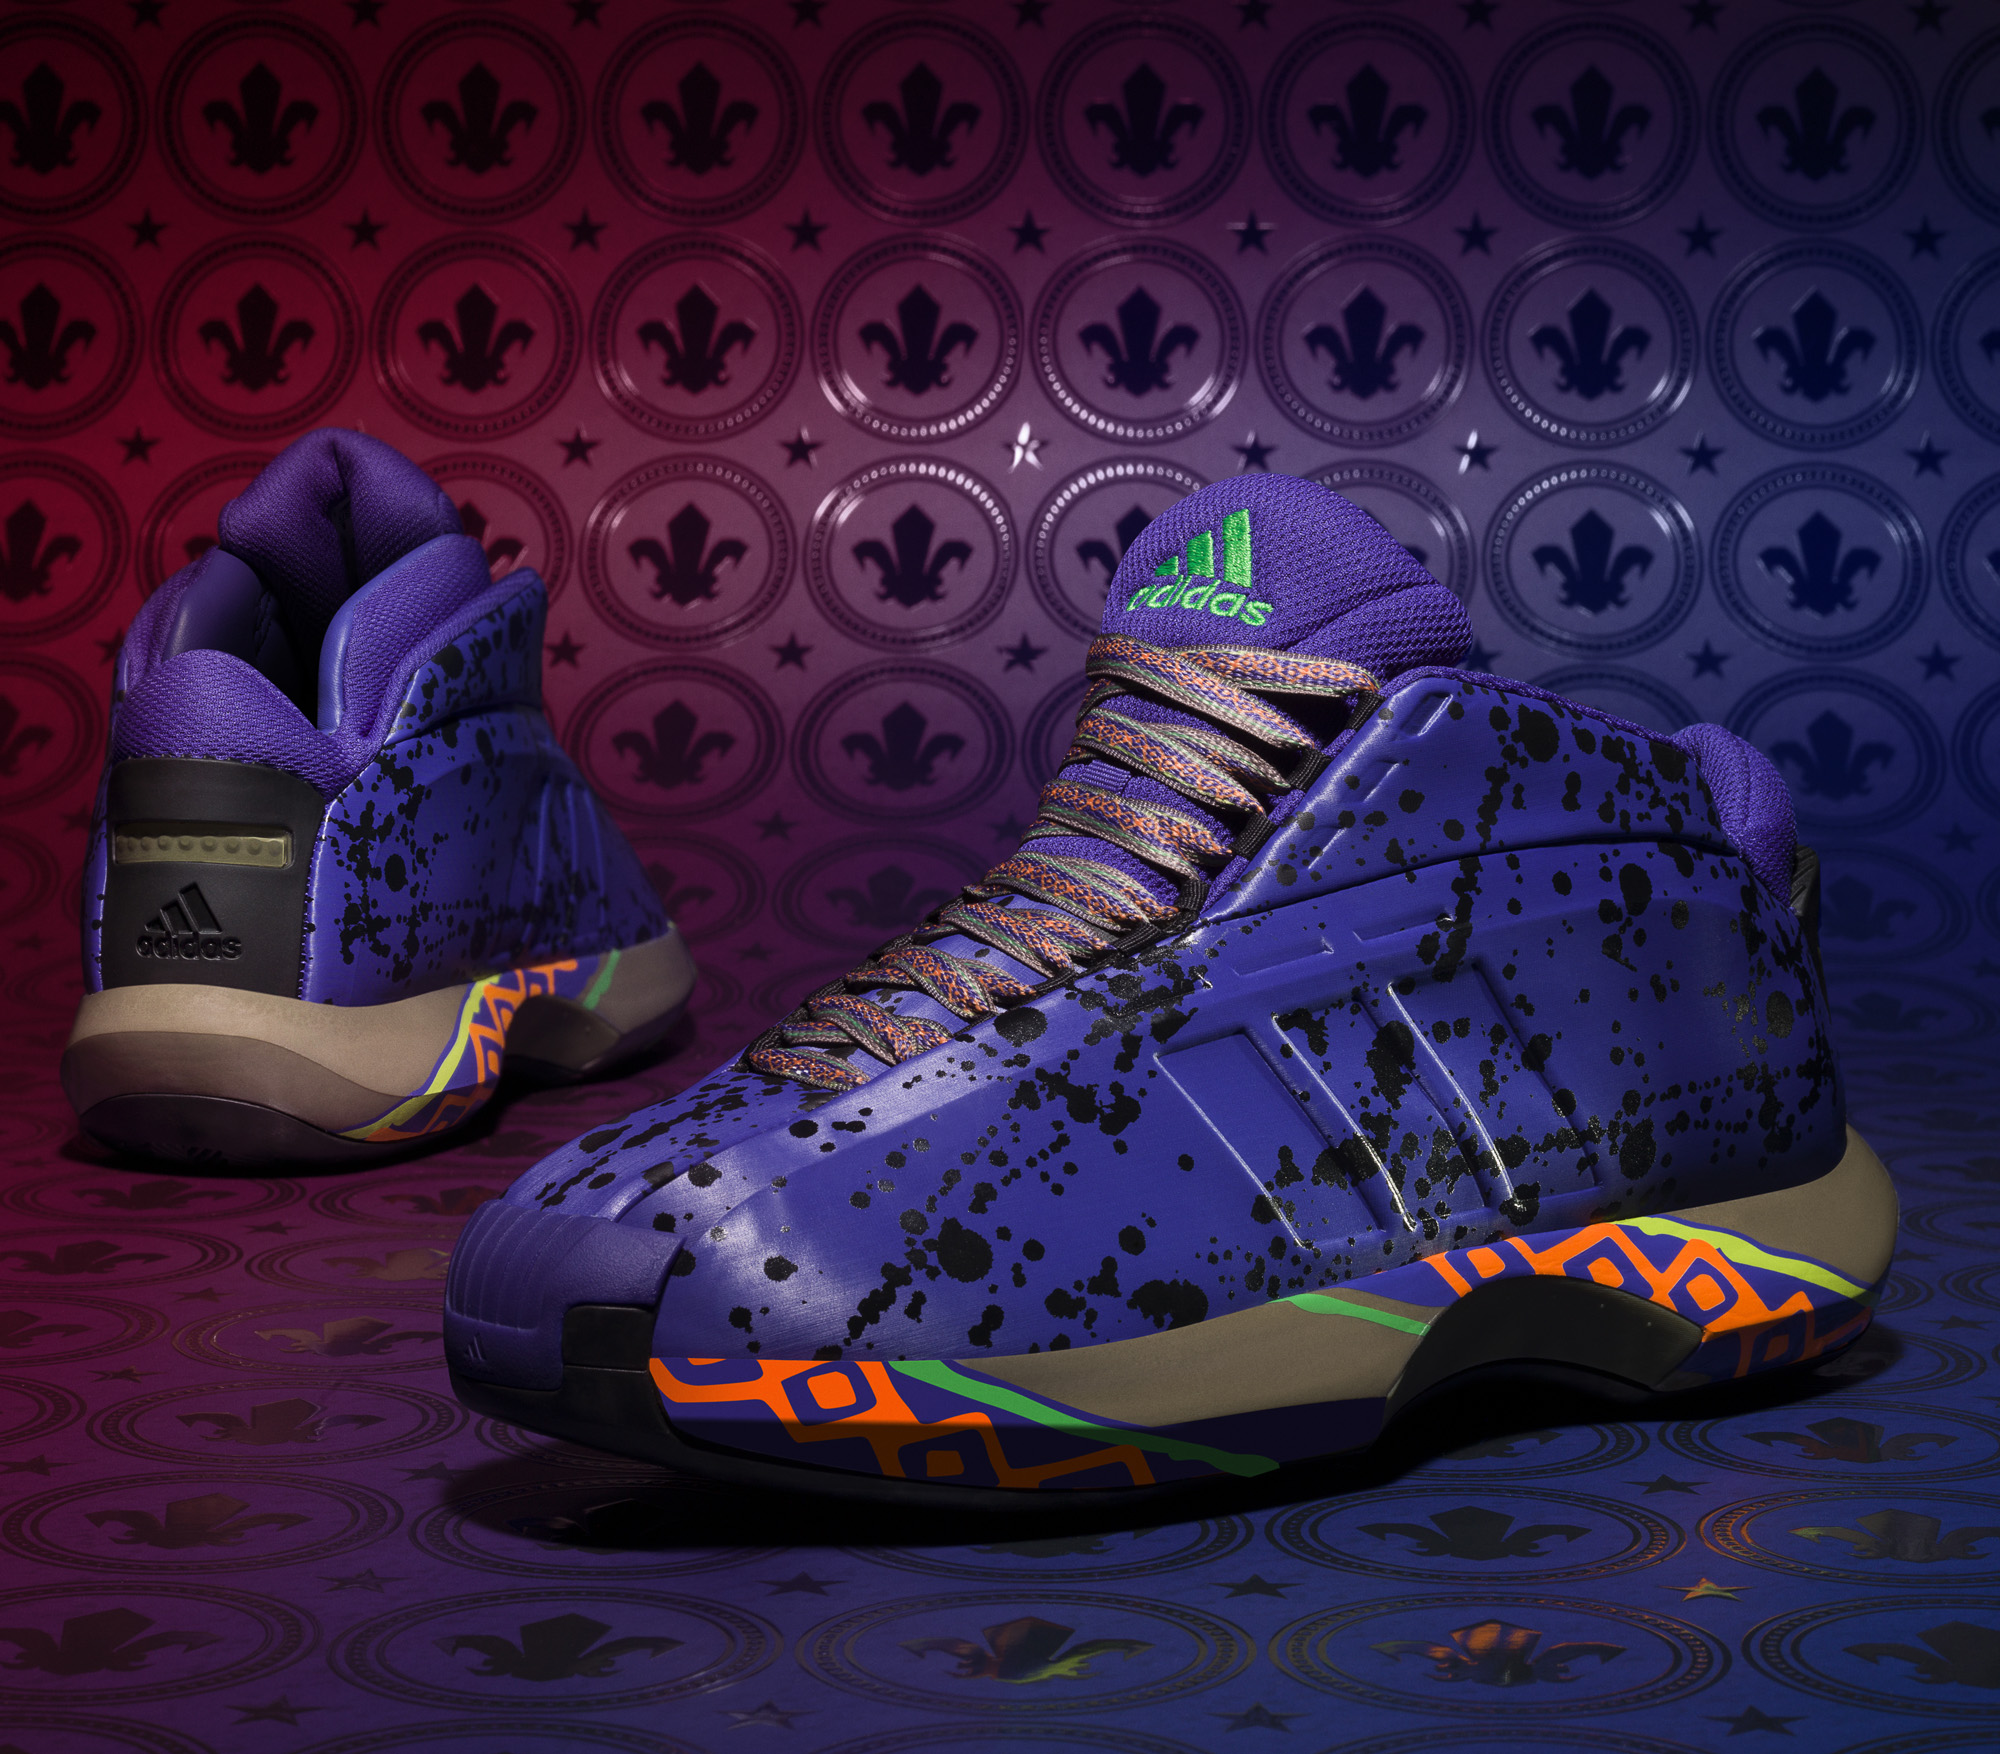 adidas basketball shoes 2014. adidas basketball shoes 2014